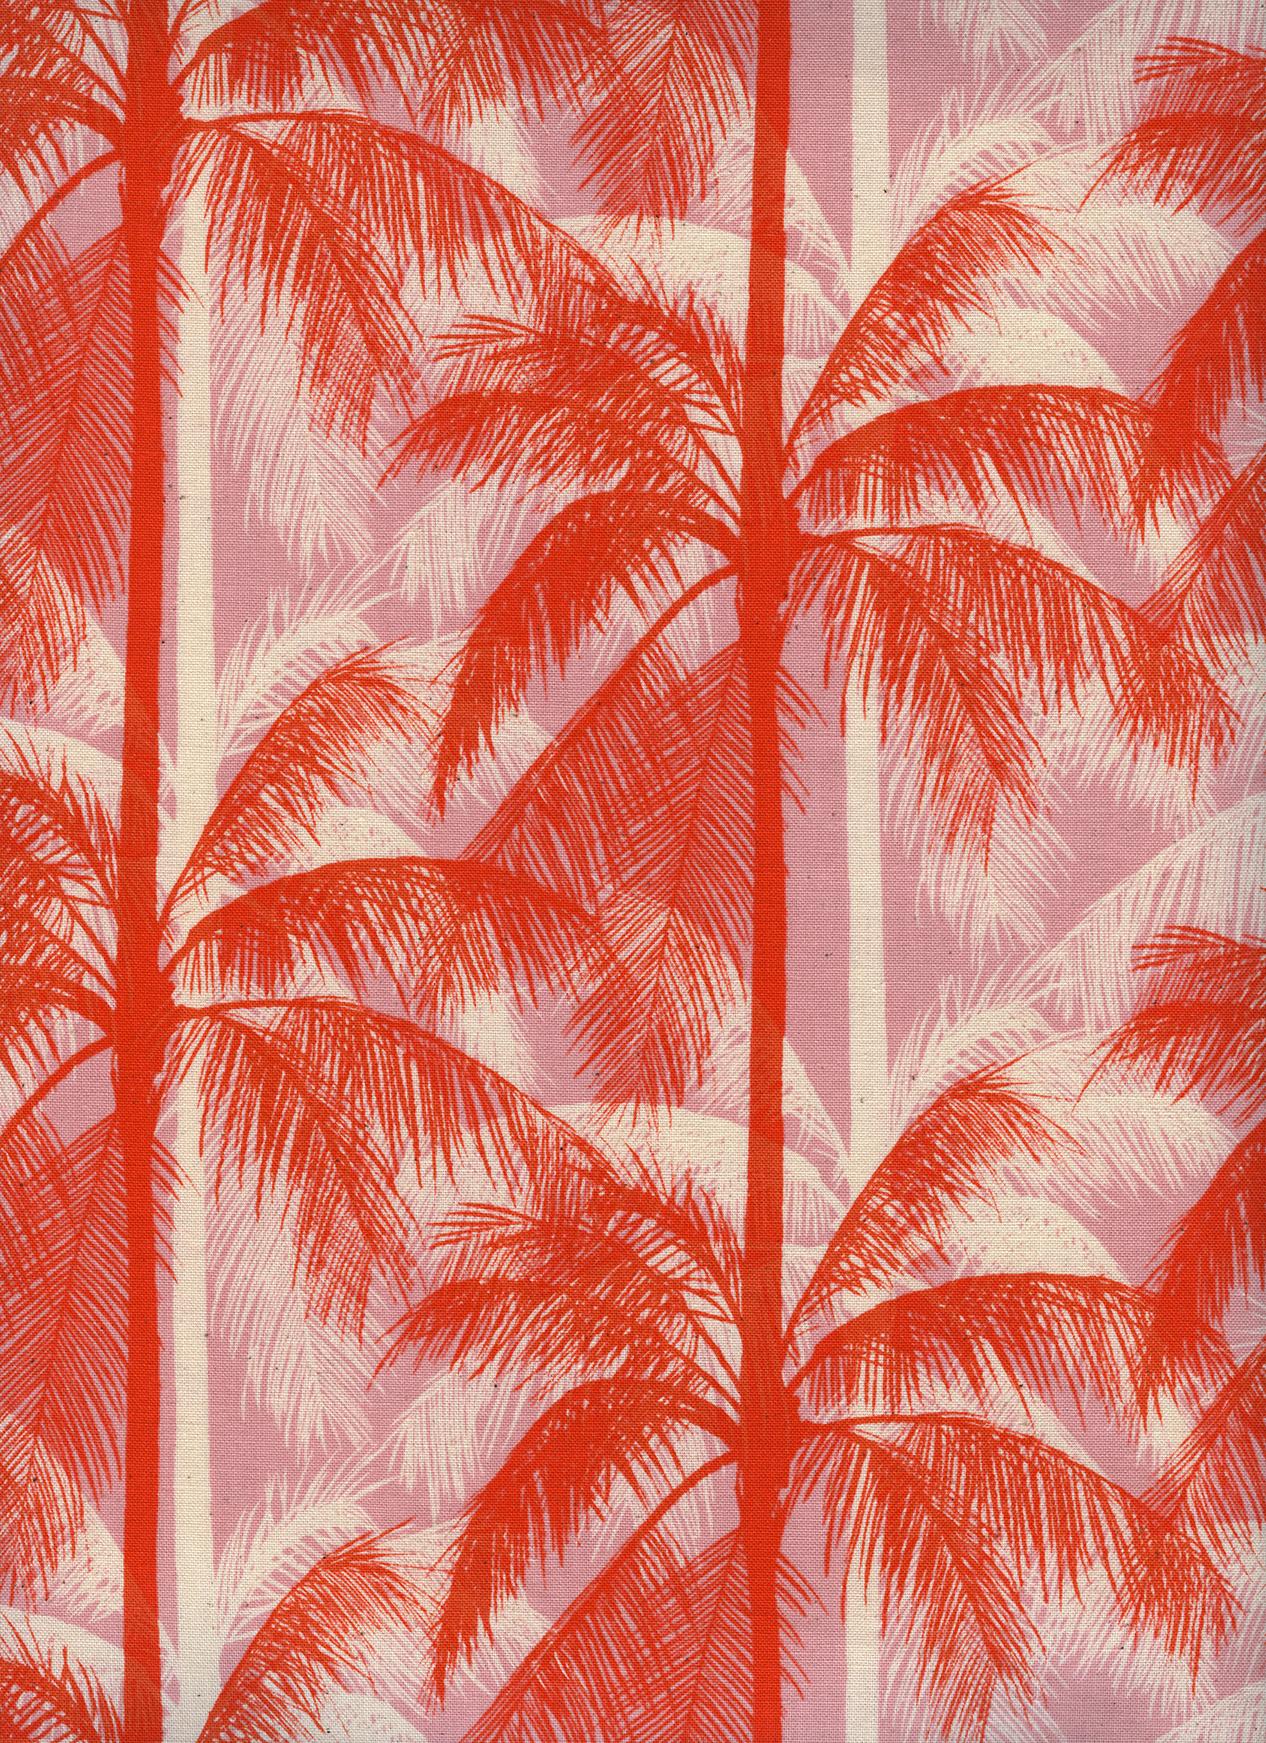 Cotton+Steel Poolside - Palms (Pink)